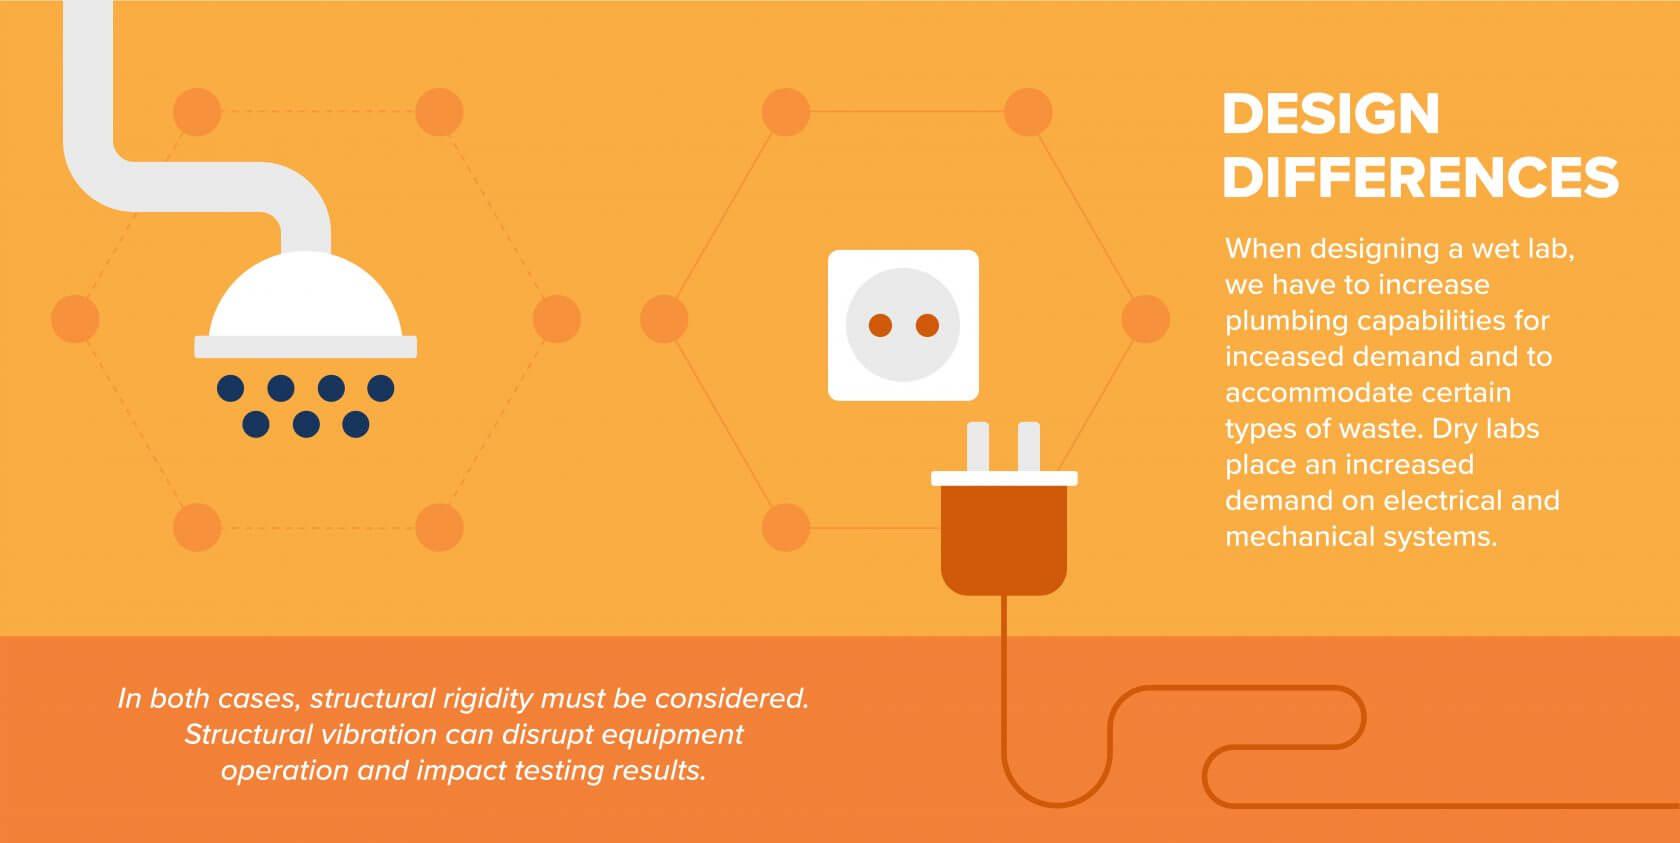 Wet Lab vs Dry Lab Design Differences